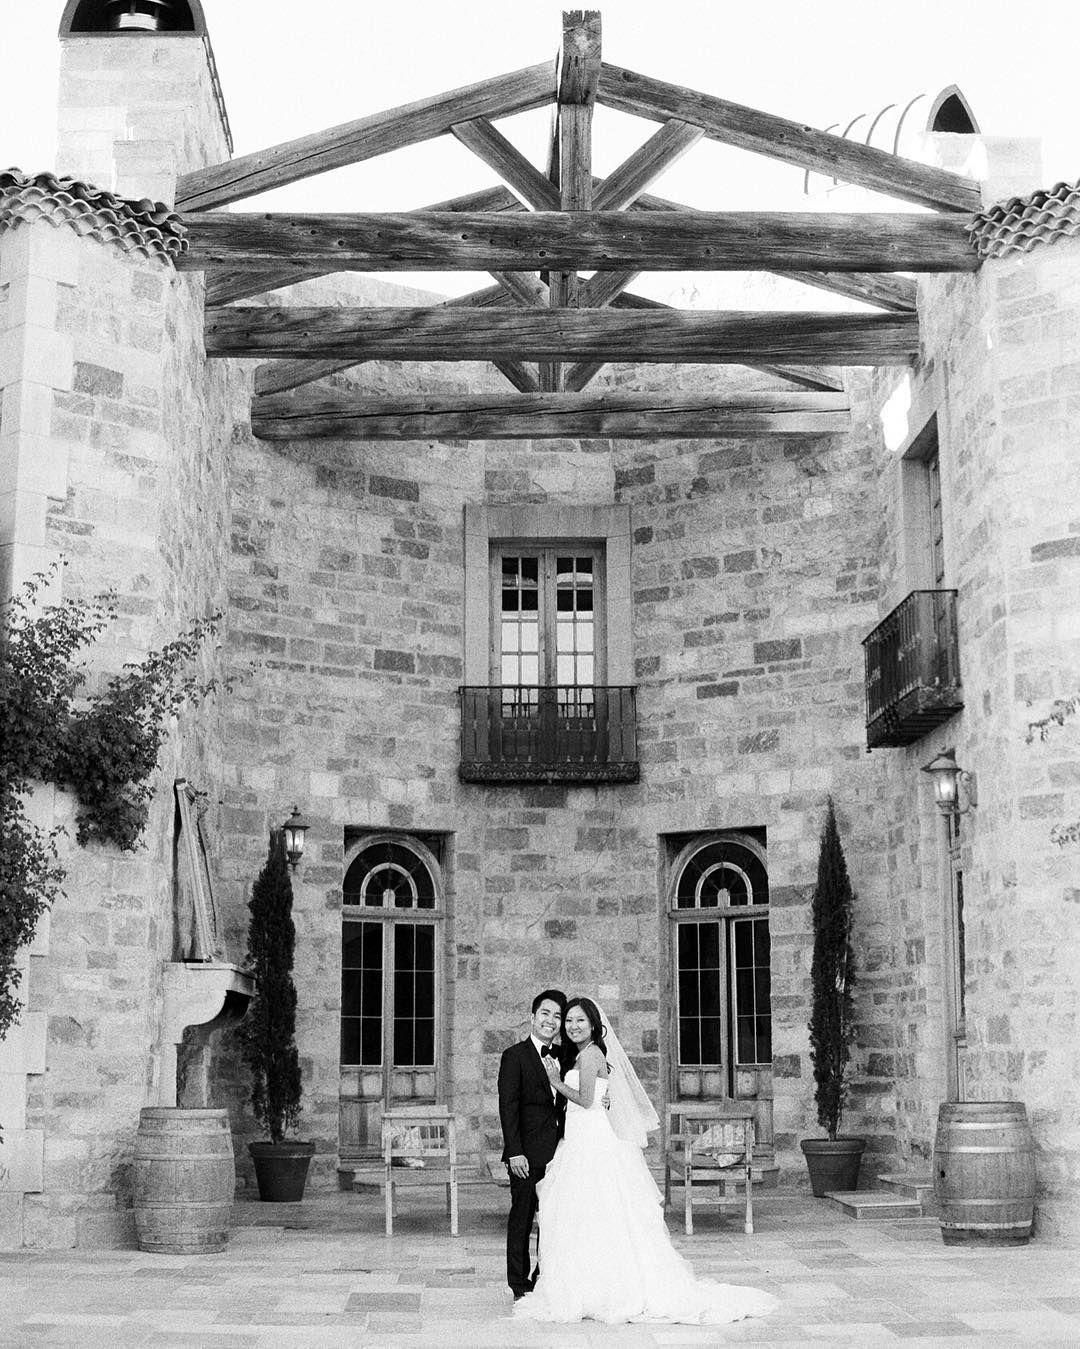 A little peek at a Sunstone Villa elopement... #sunstonevillawedding #ilforddelta3200 #sunstonevilla #santayenezwedding by lavenderandtwine